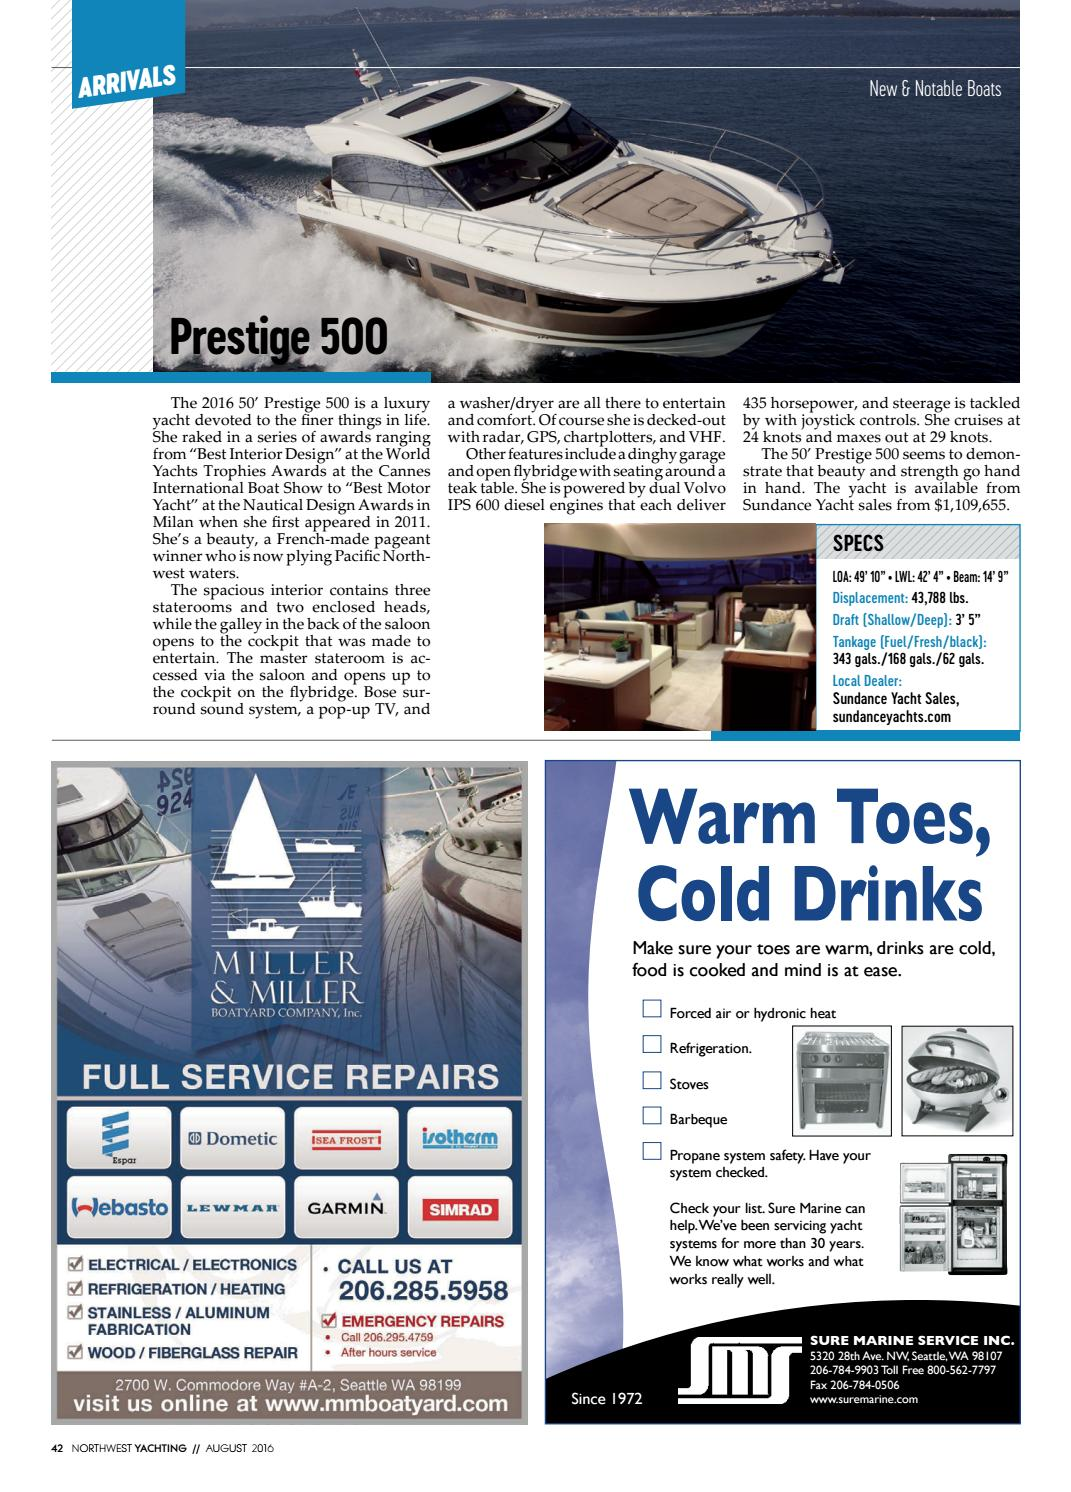 Northwest Yachting August 2016 by Northwest Yachting - issuu